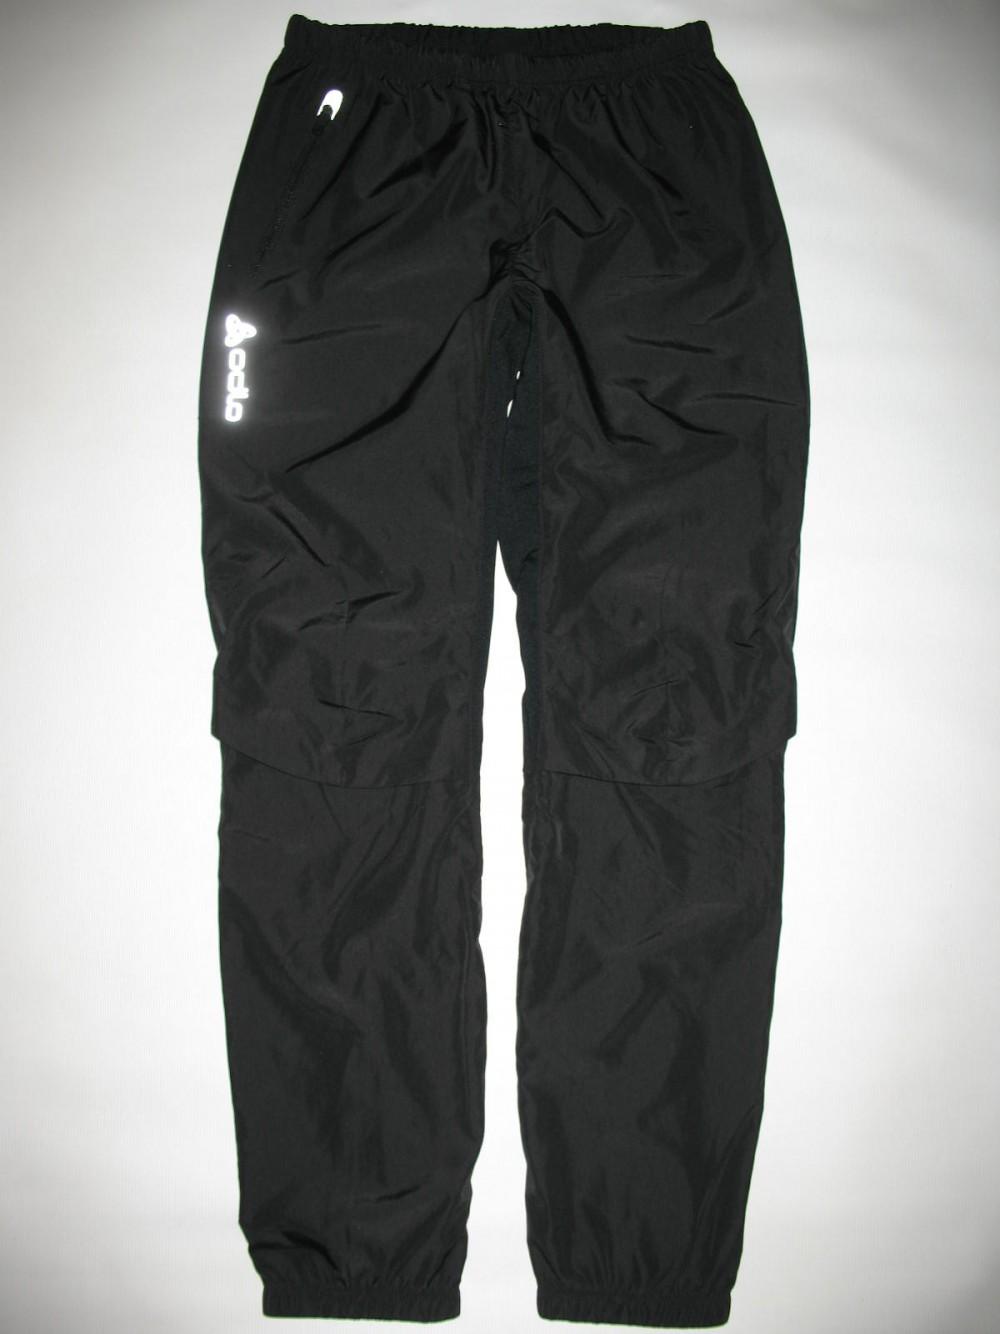 Штаны ODLO logic windproof pants (размер M) - 1